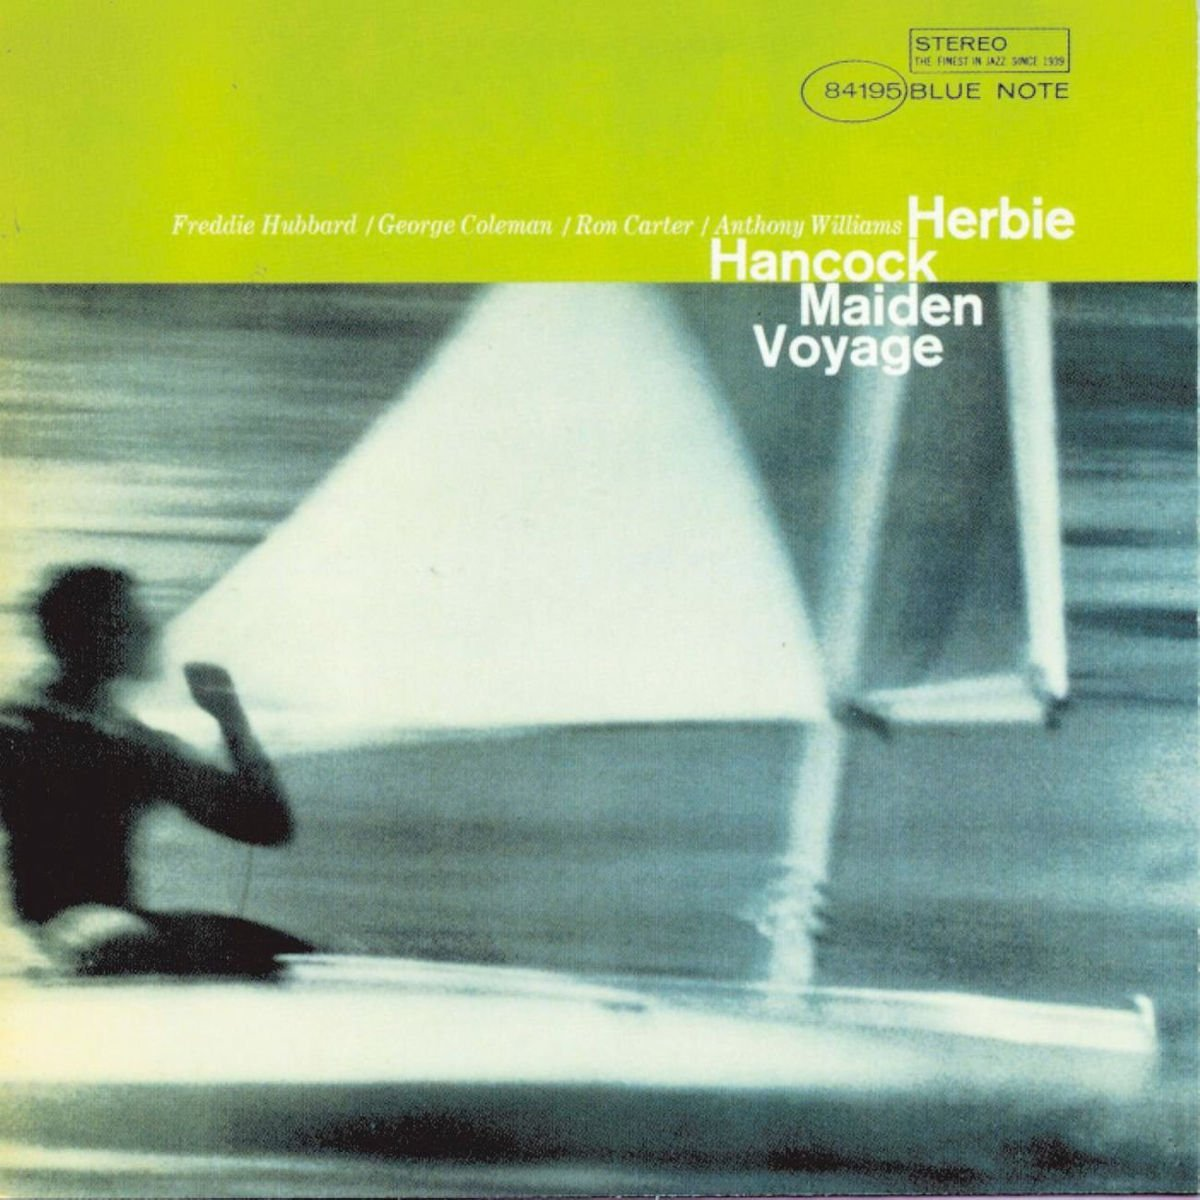 Herbie-Hancock-Maiden-Voyage-CD-cover